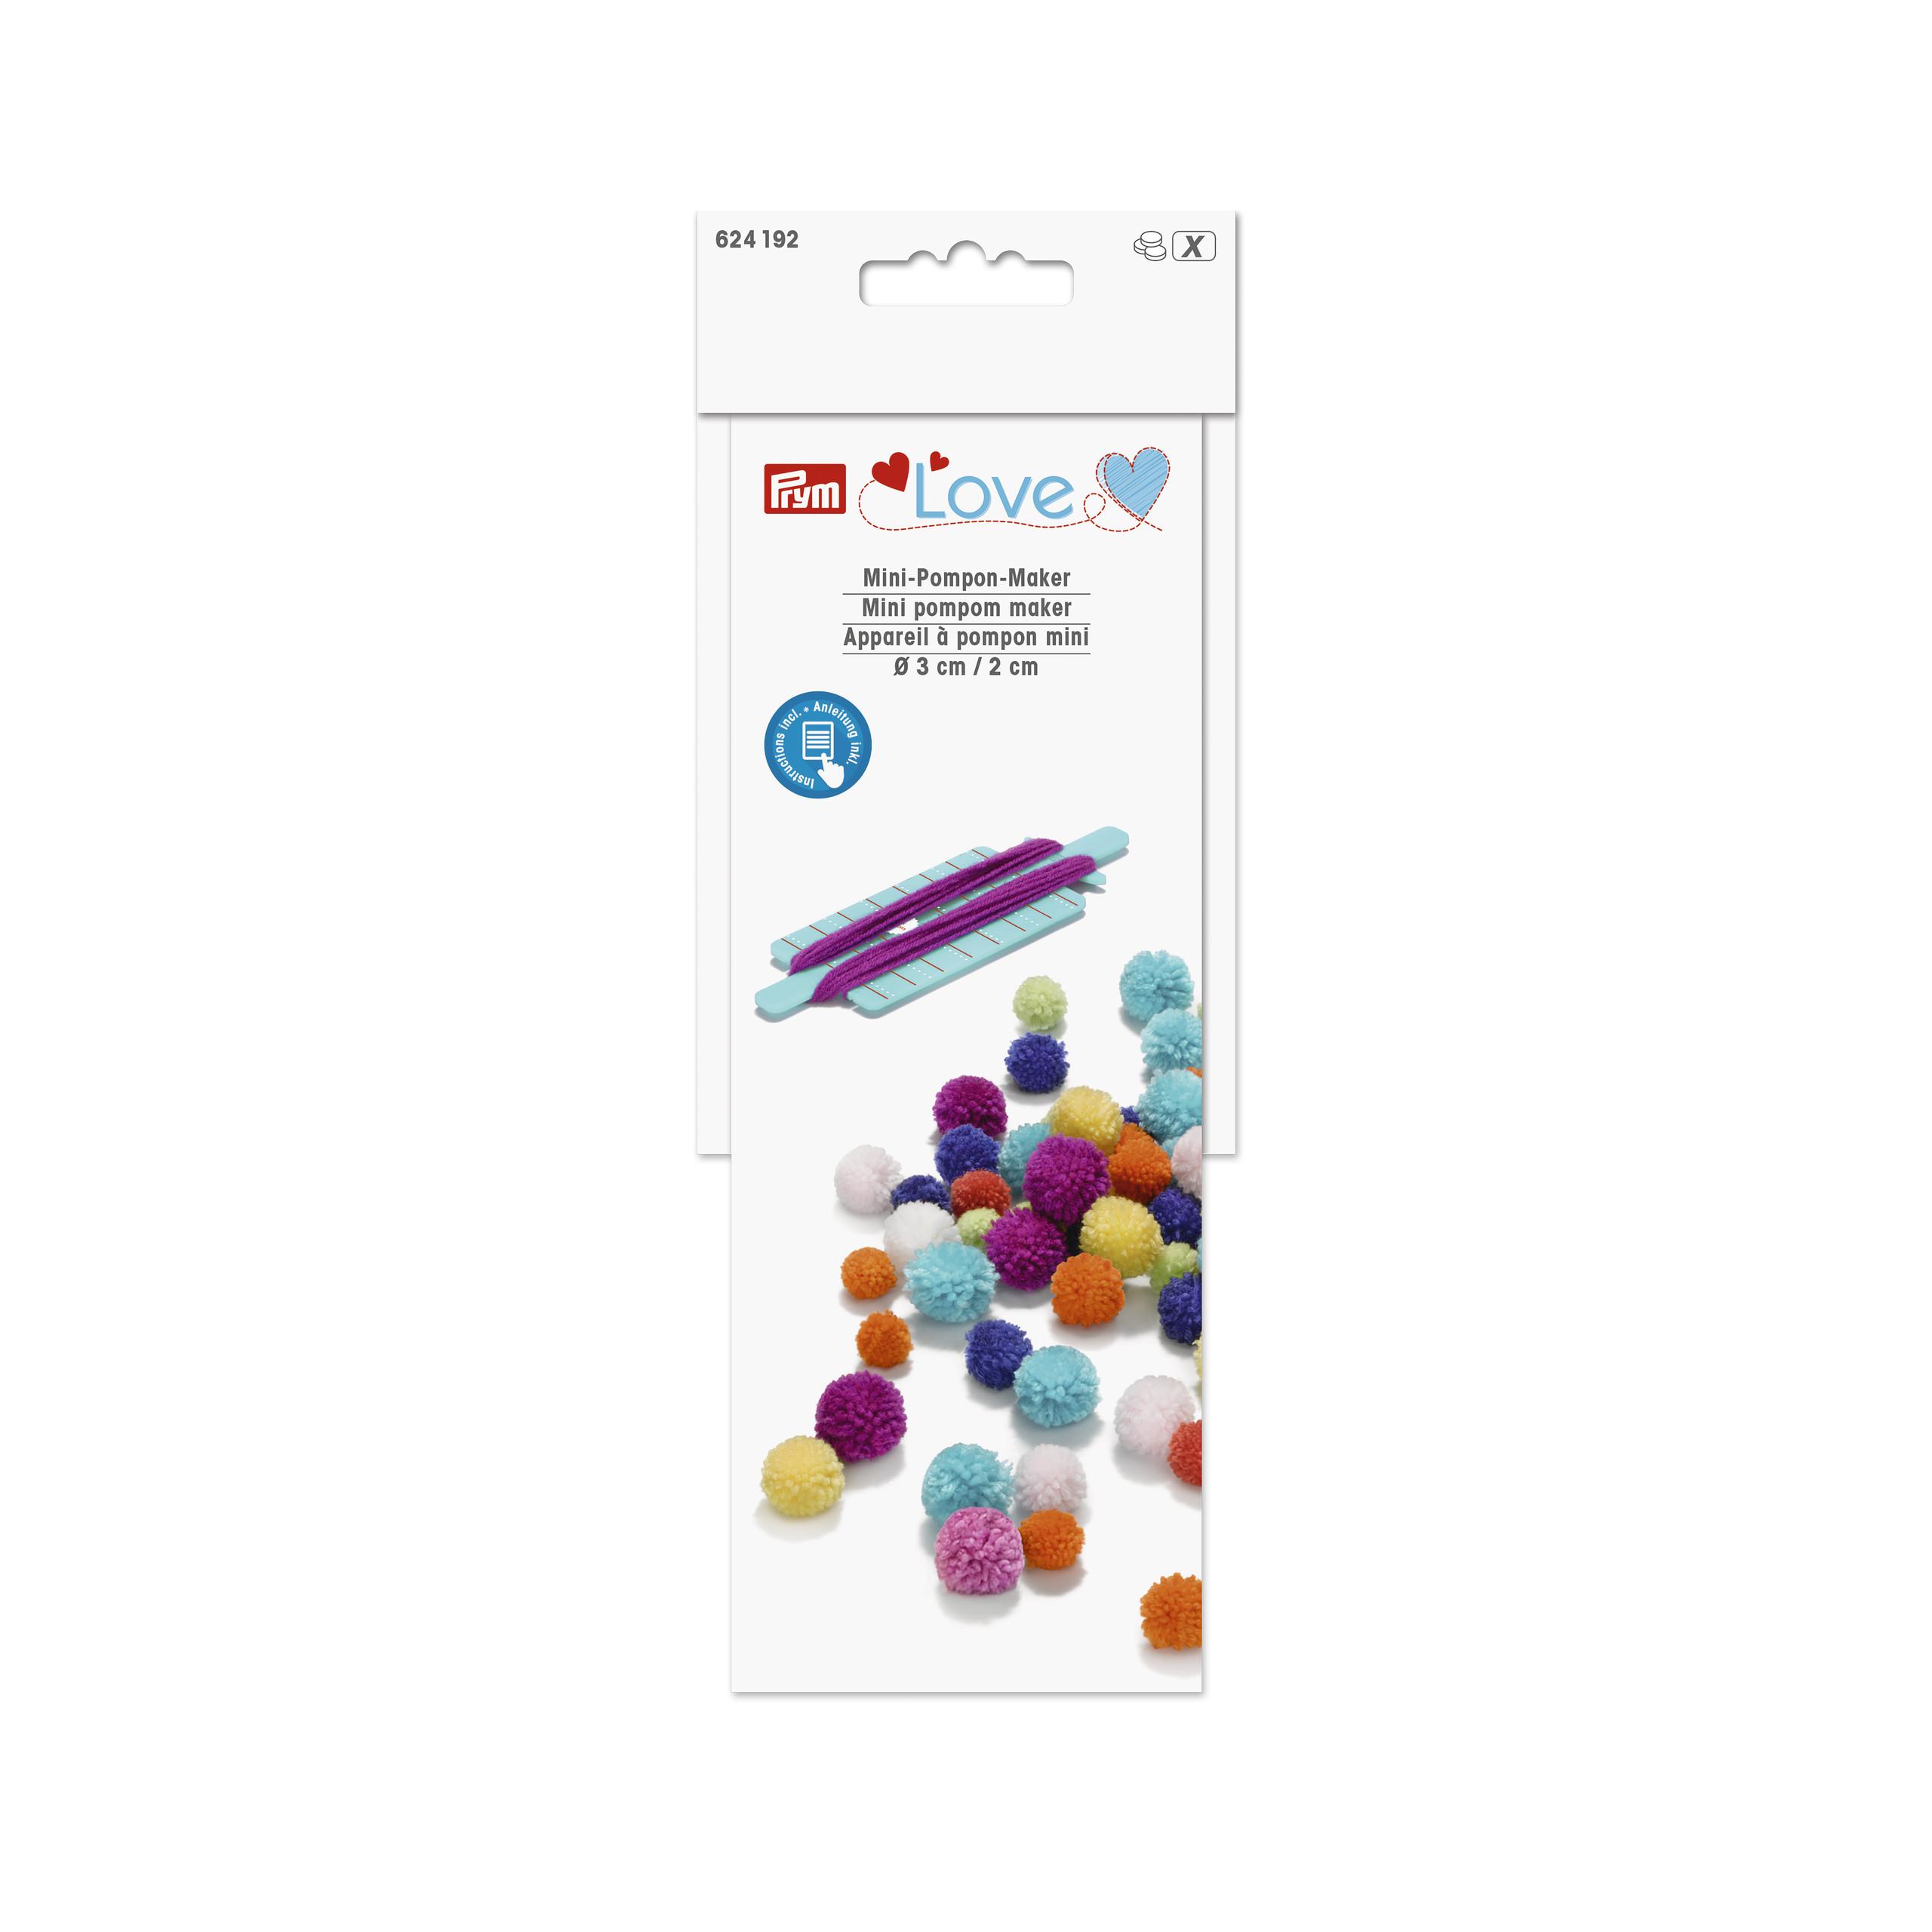 Prym 624192 Mini-Pompon-Marker